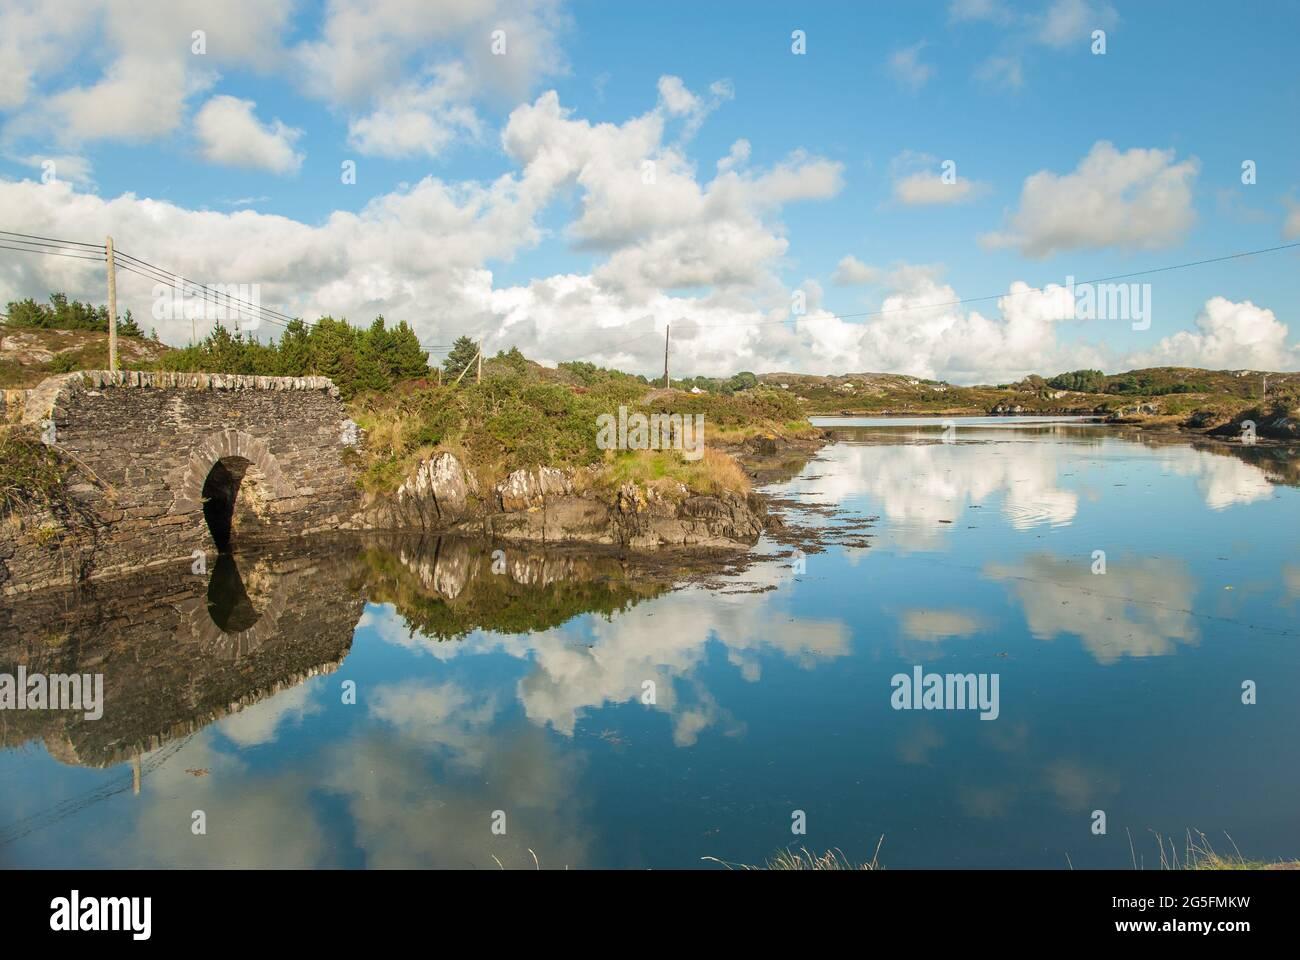 Kealfadda bridge west cork Stock Photo - Alamy